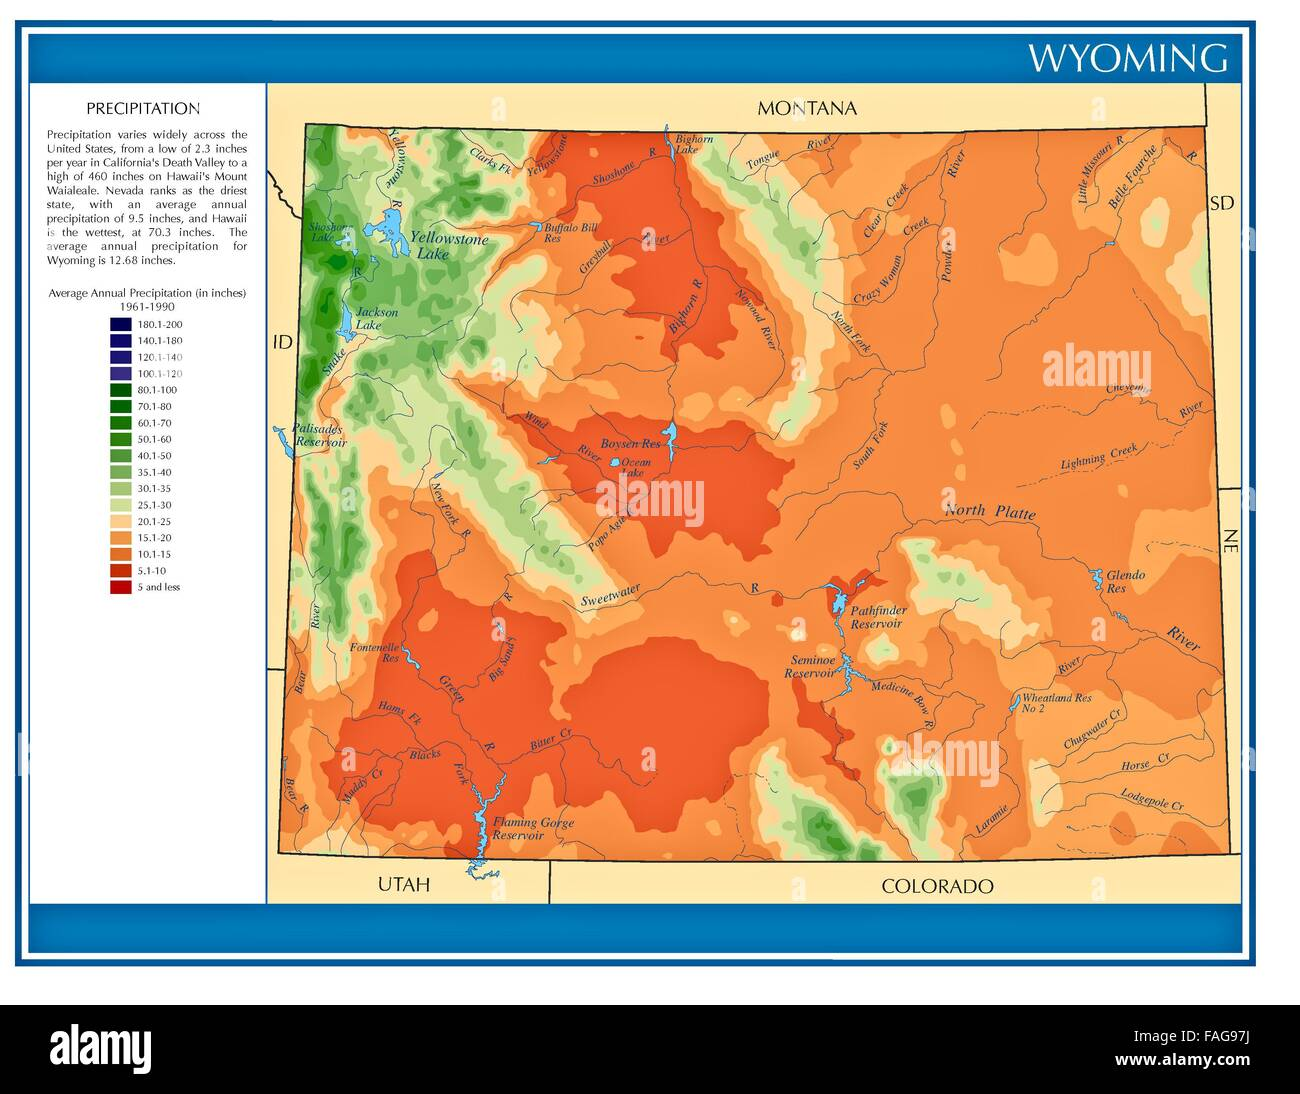 Wyoming United States Water Precipitation Statistics Map